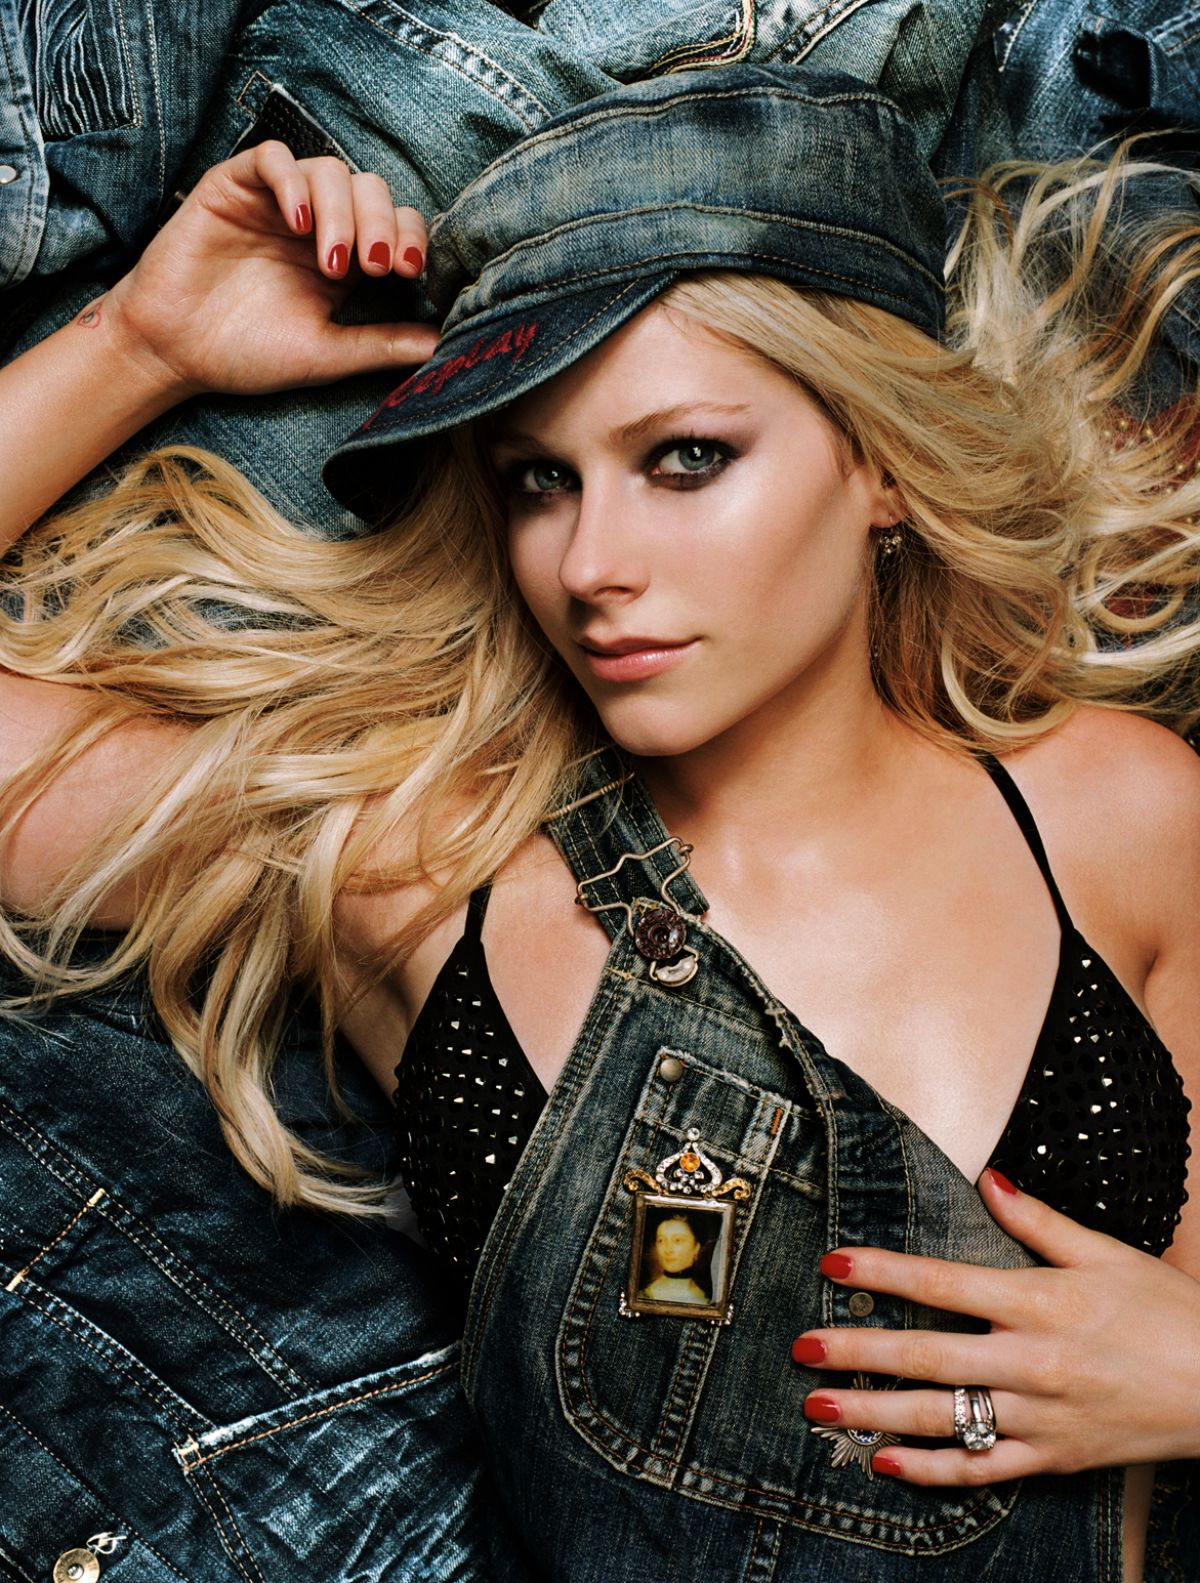 Avril Lavigne 2020 : Avril Lavigne – Vanity Fair Magazine (2006)-05